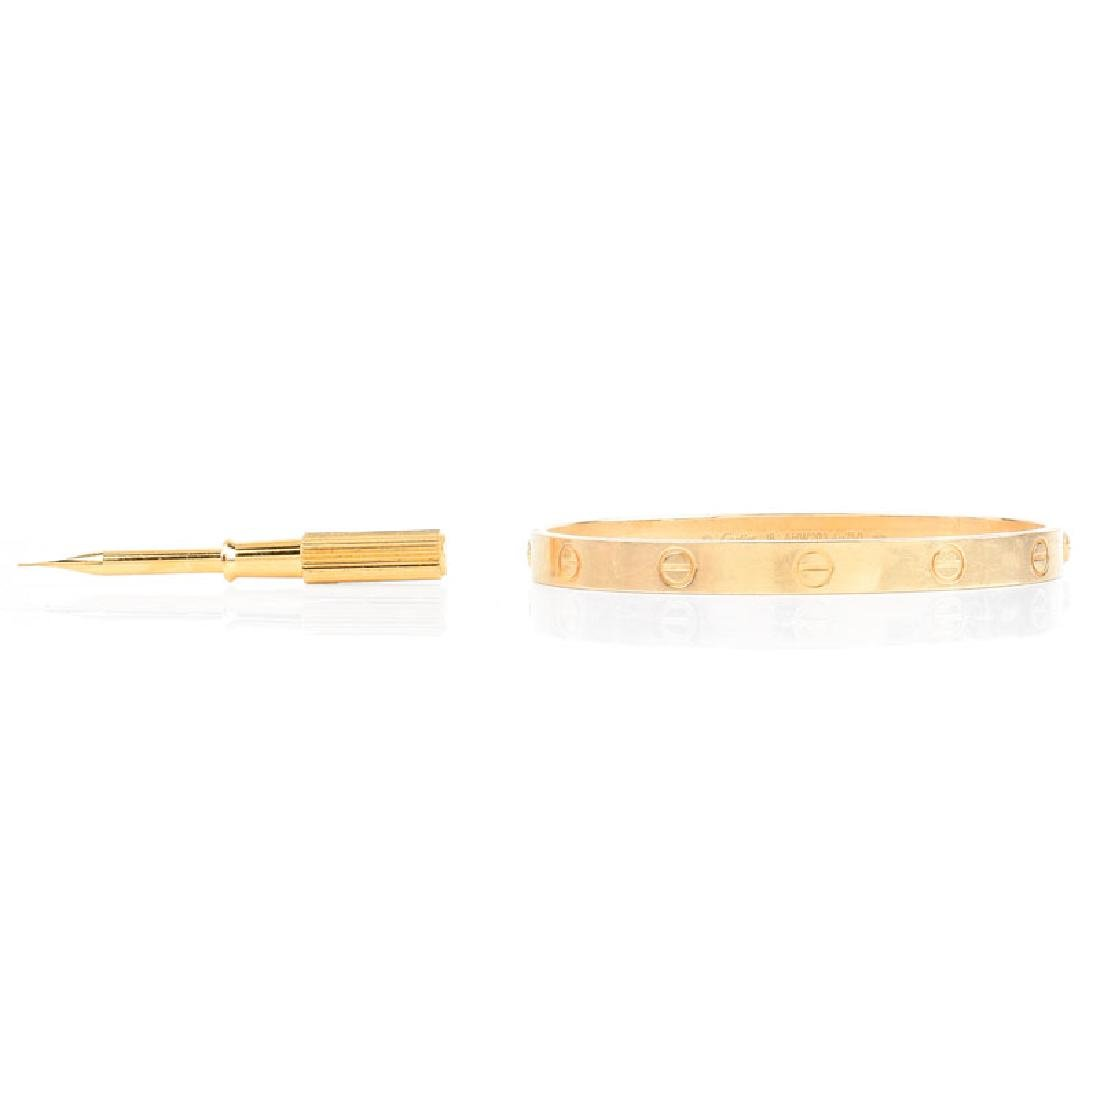 Circa 2014 Cartier 18 Karat Yellow Gold Love Bracelet - 2